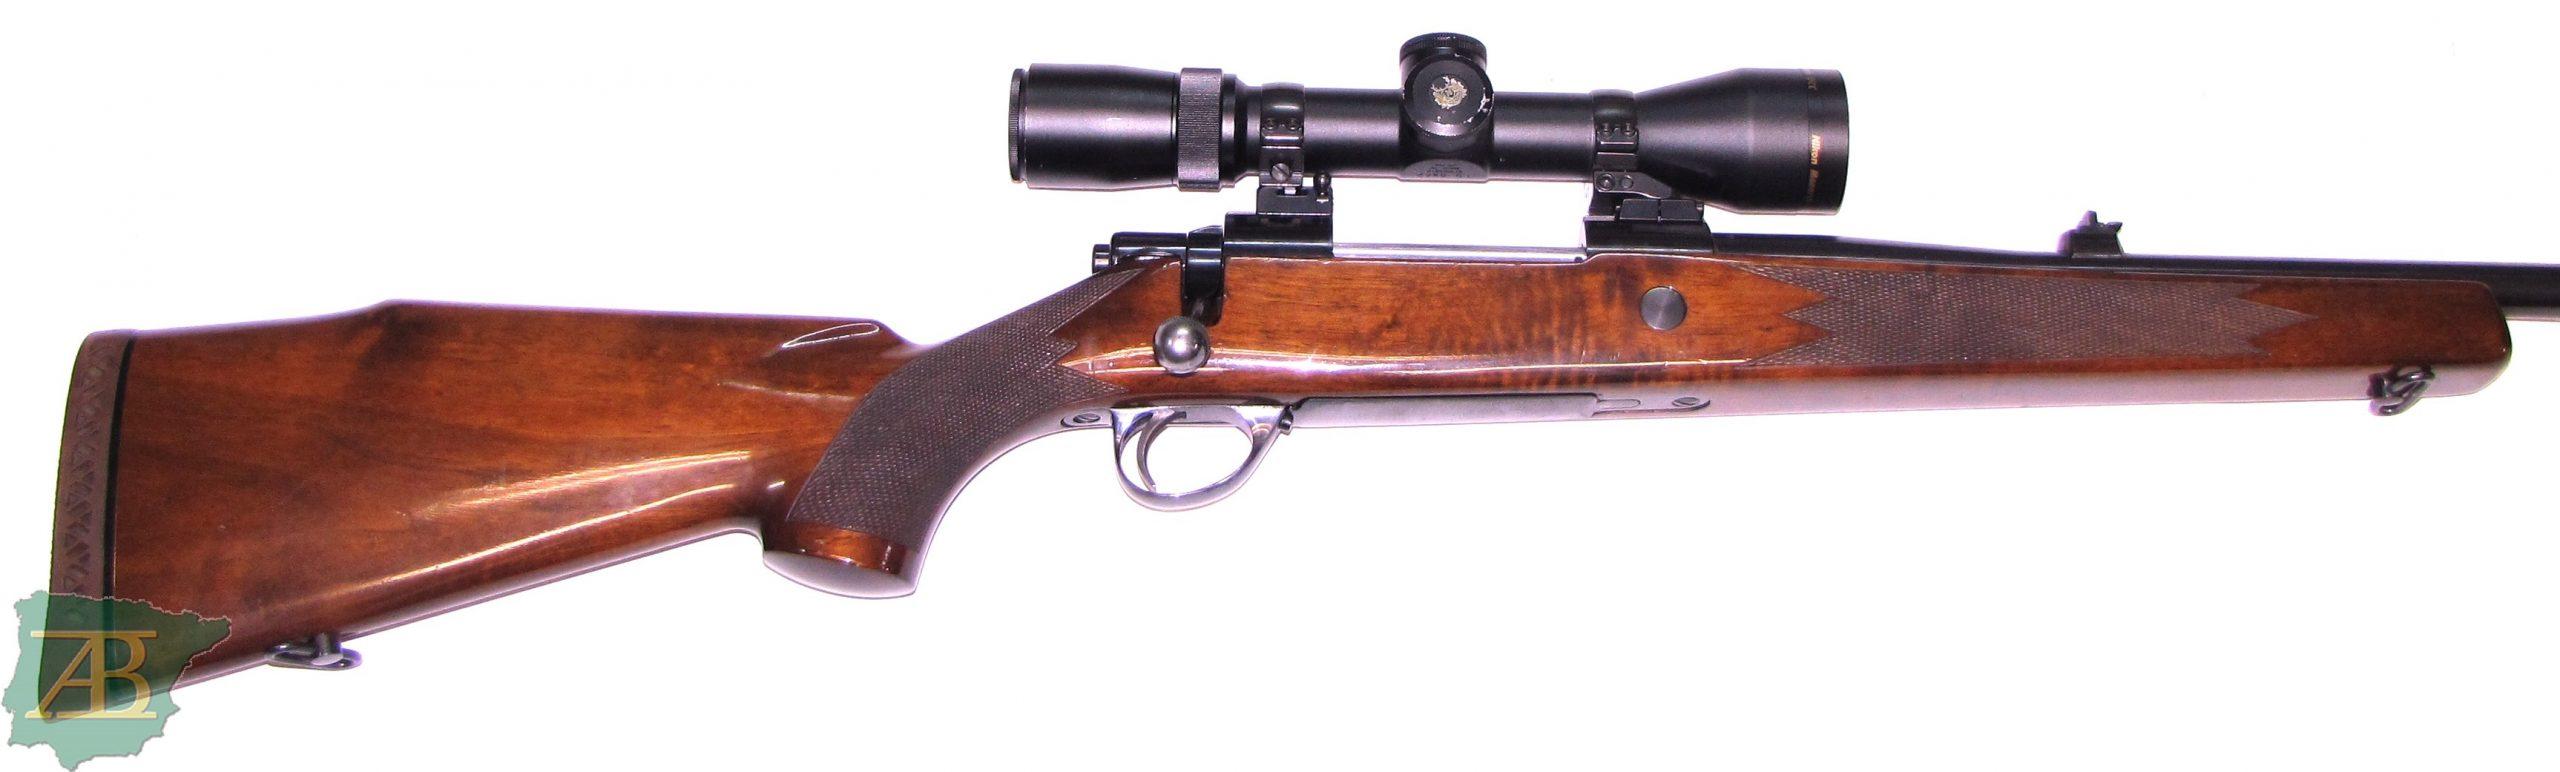 Rifle de cerrojo de caza SAKO L61R Ref 5171-armeriaiberica-2